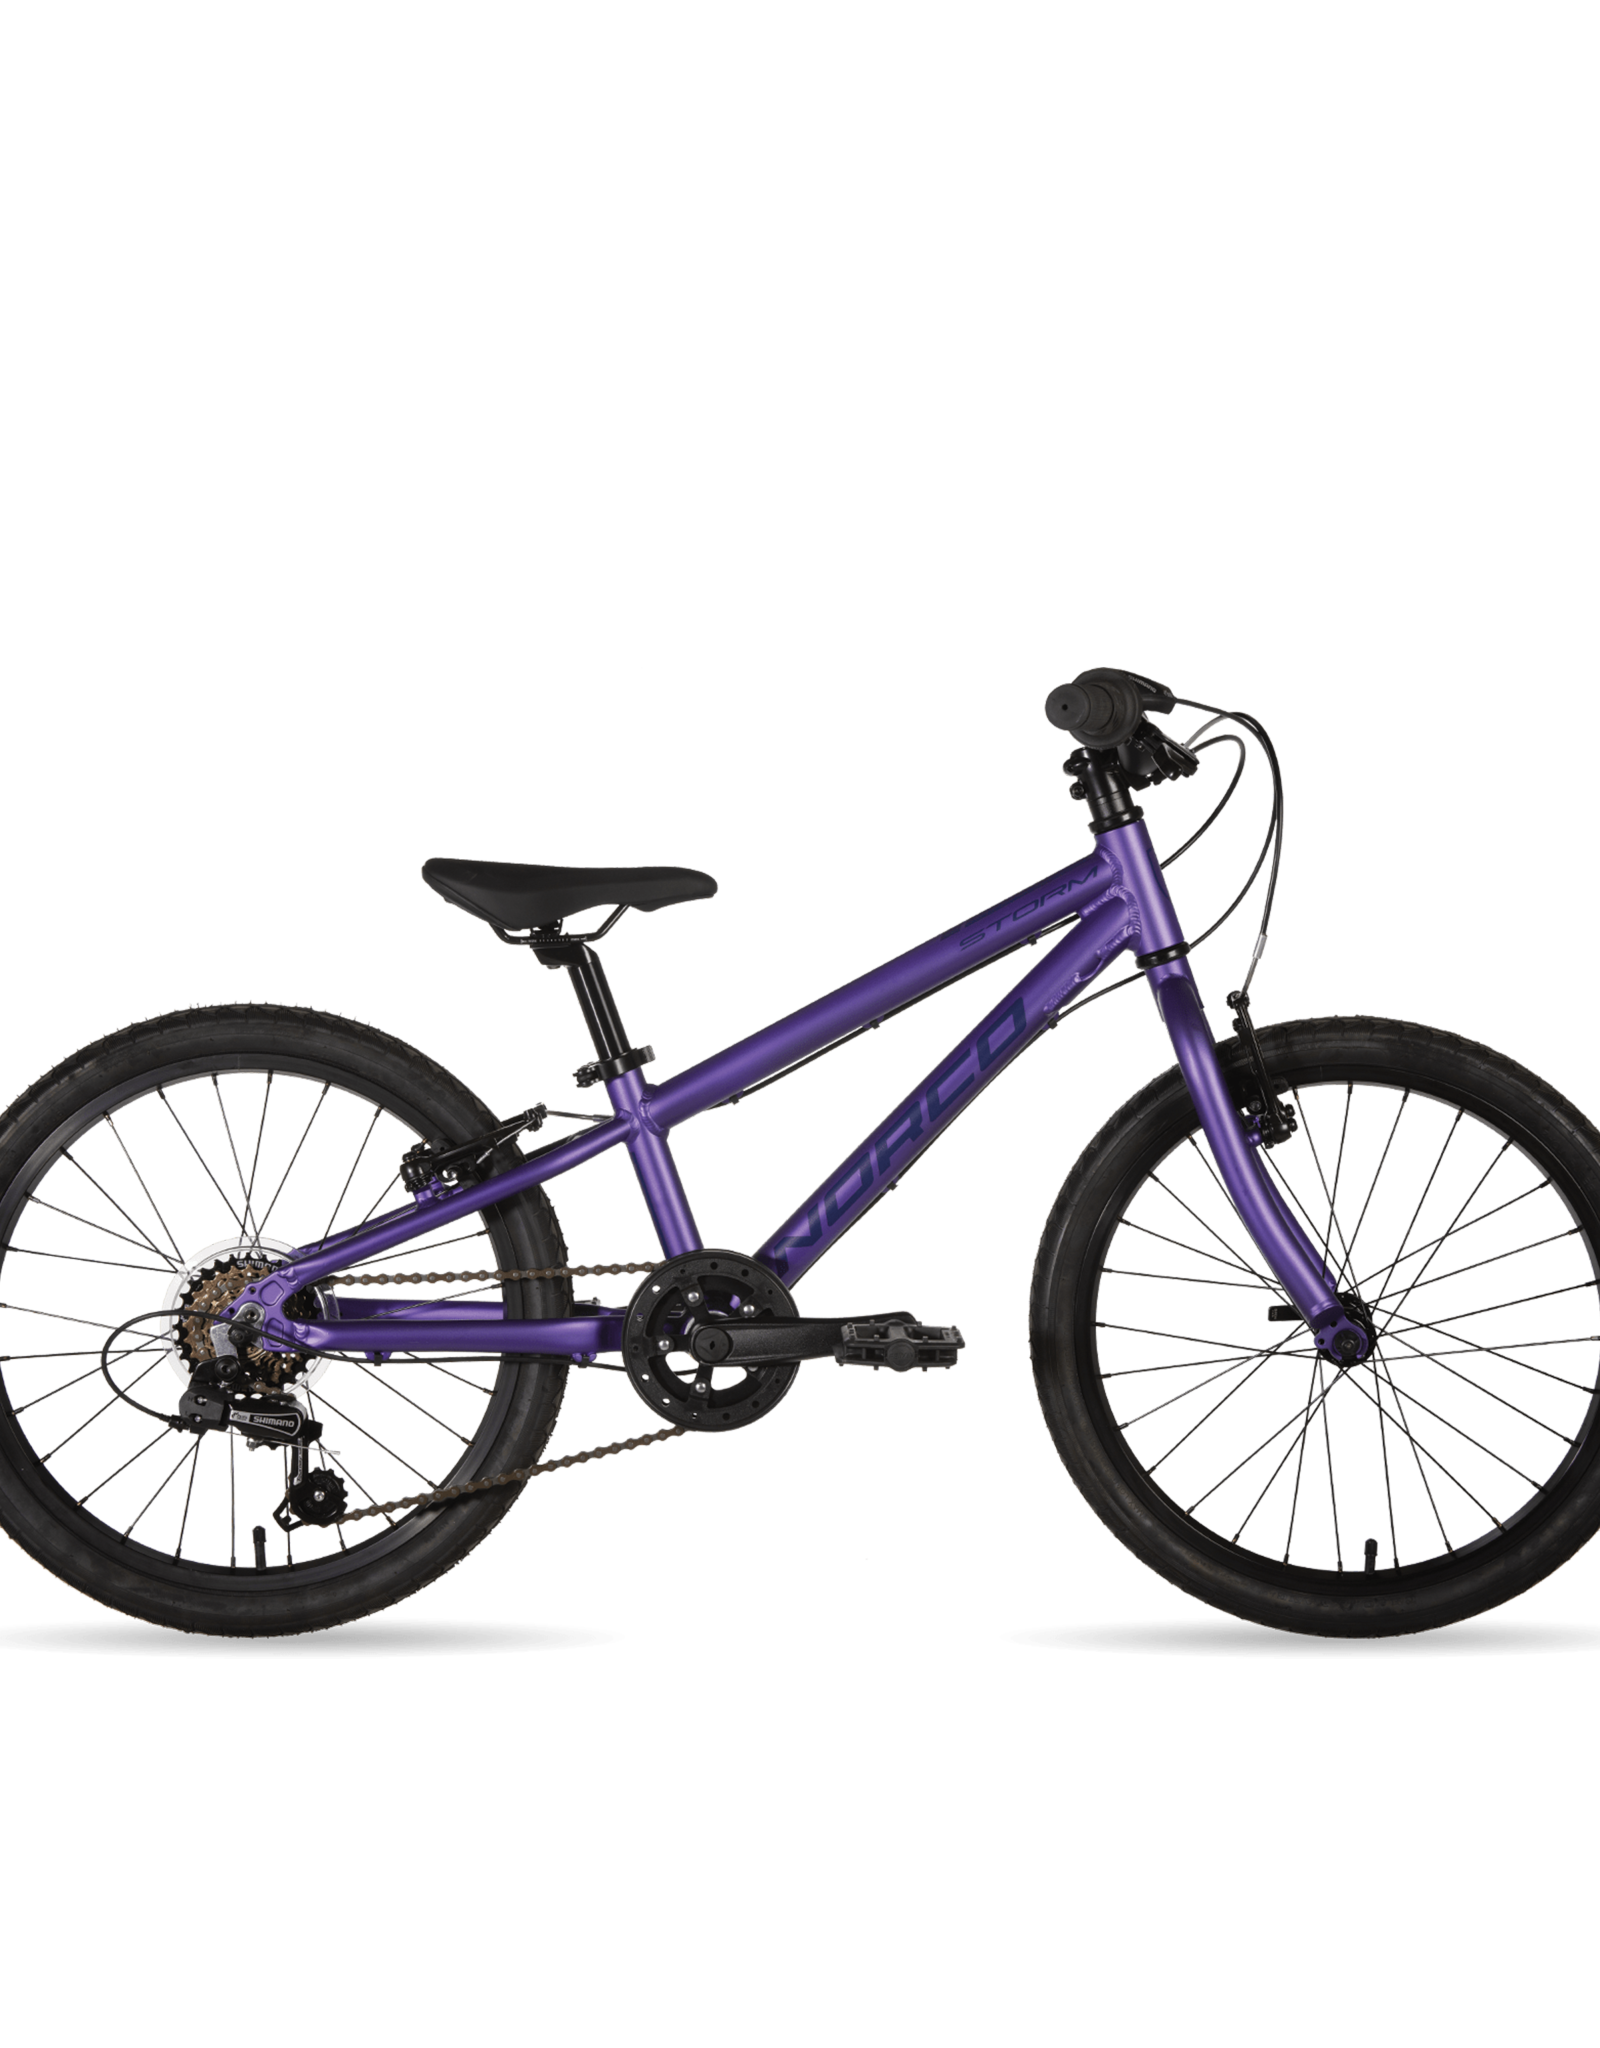 "NORCO NORCO Bike STORM 2.3 20"" Wheel"